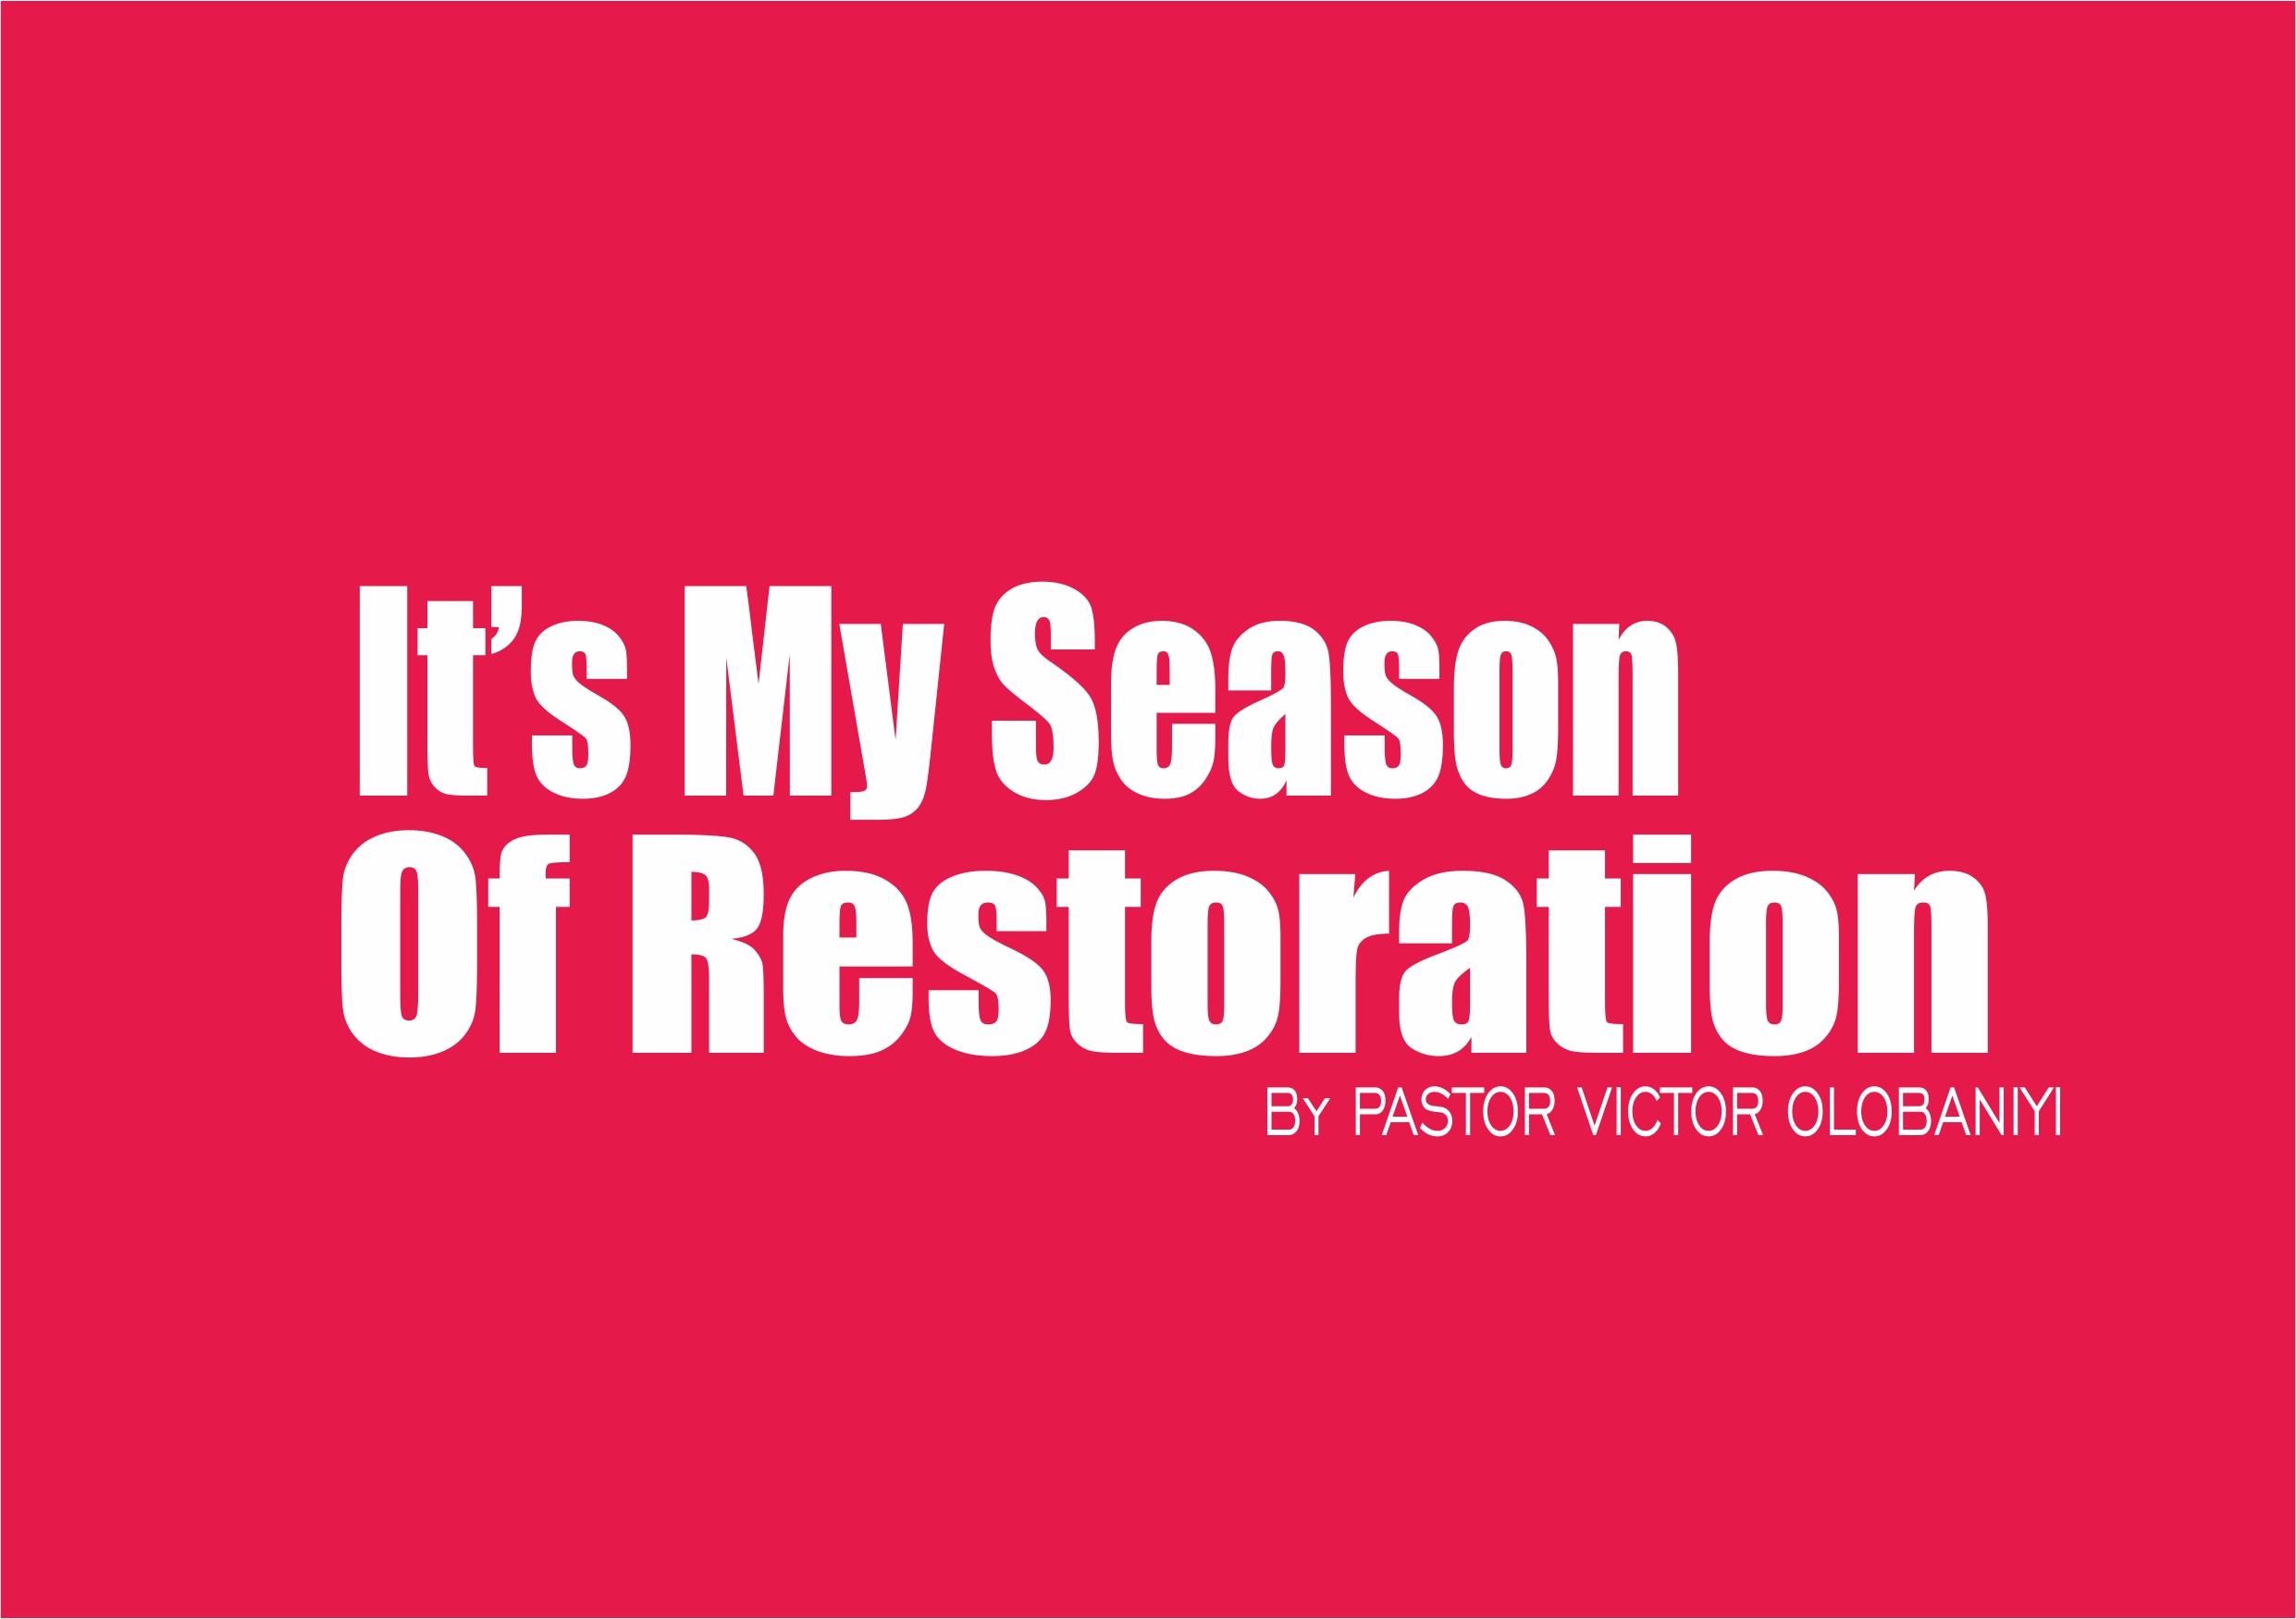 It's My Season Of Restoration, by Pastor Victor Olobaniyi